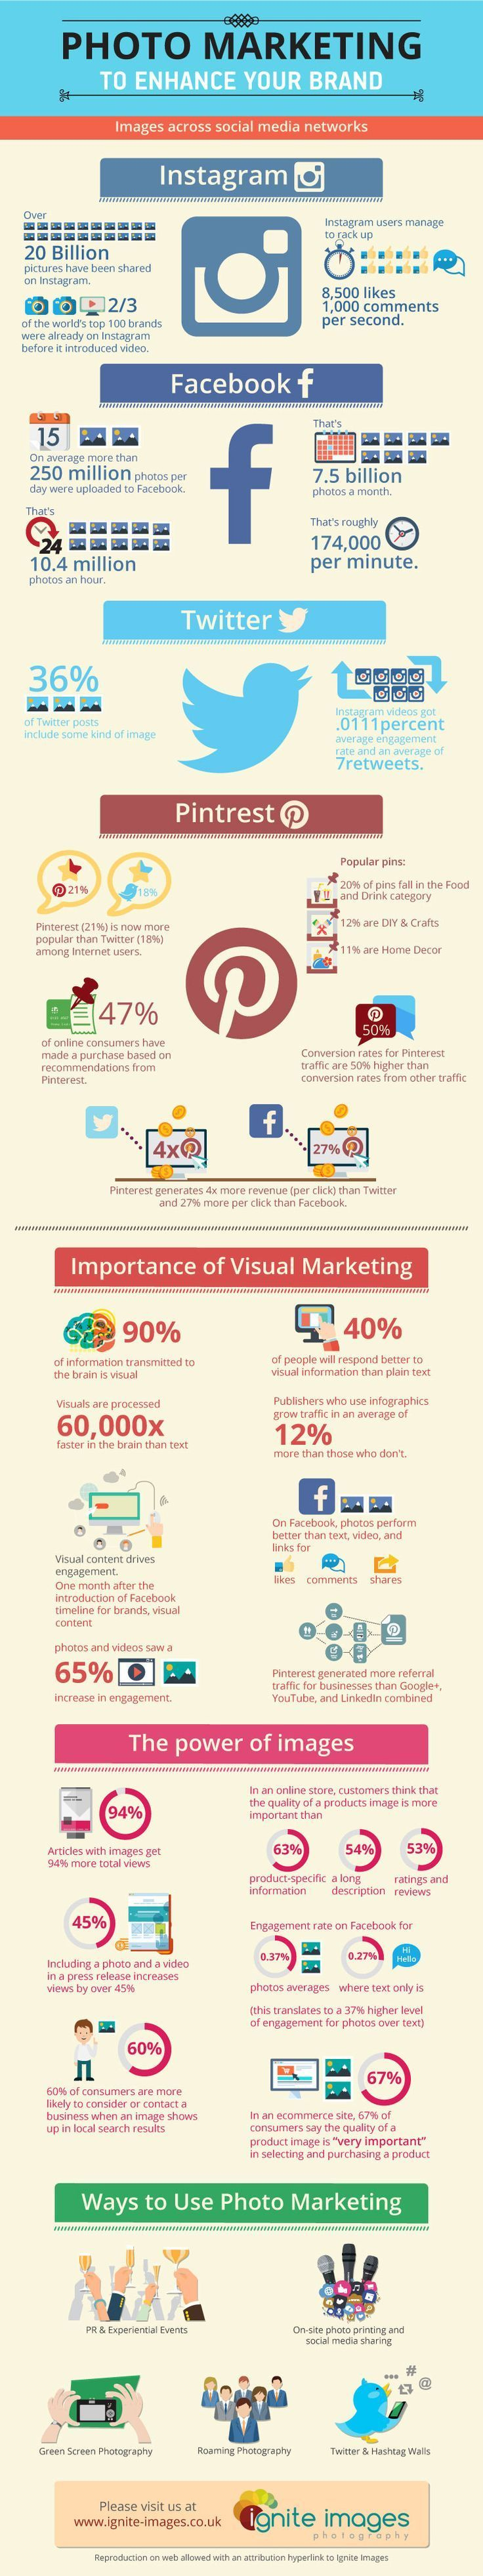 Photo Marketing to Enhance Your Brand -